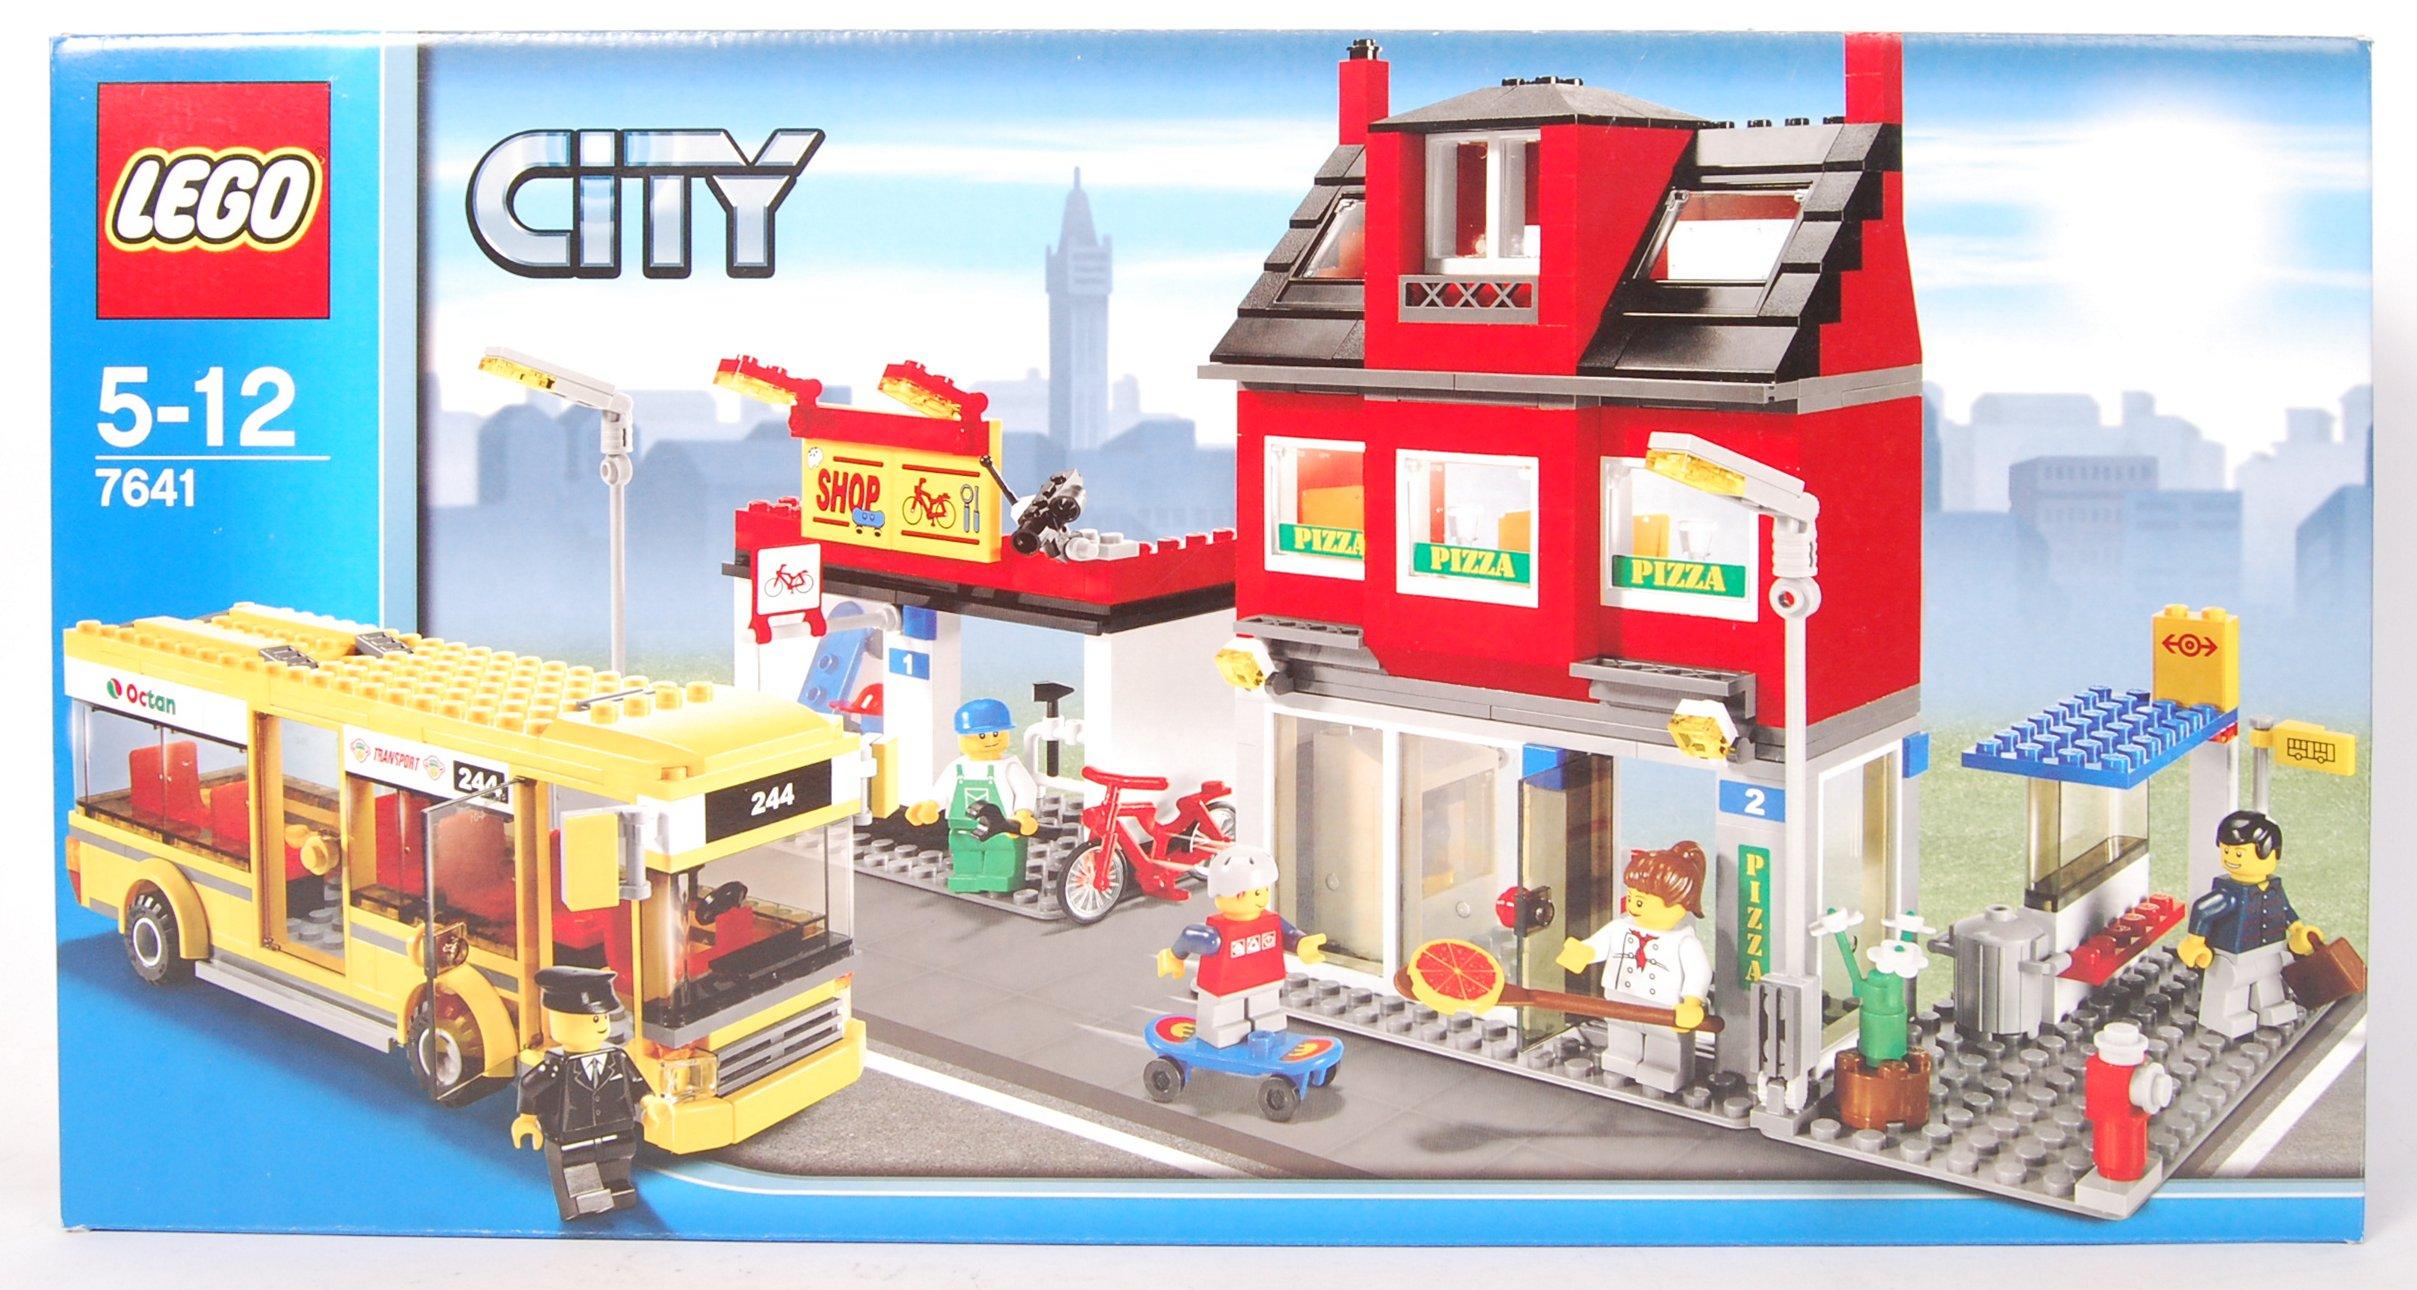 LEGO CITY SET NO. 7641 CITY CORNER